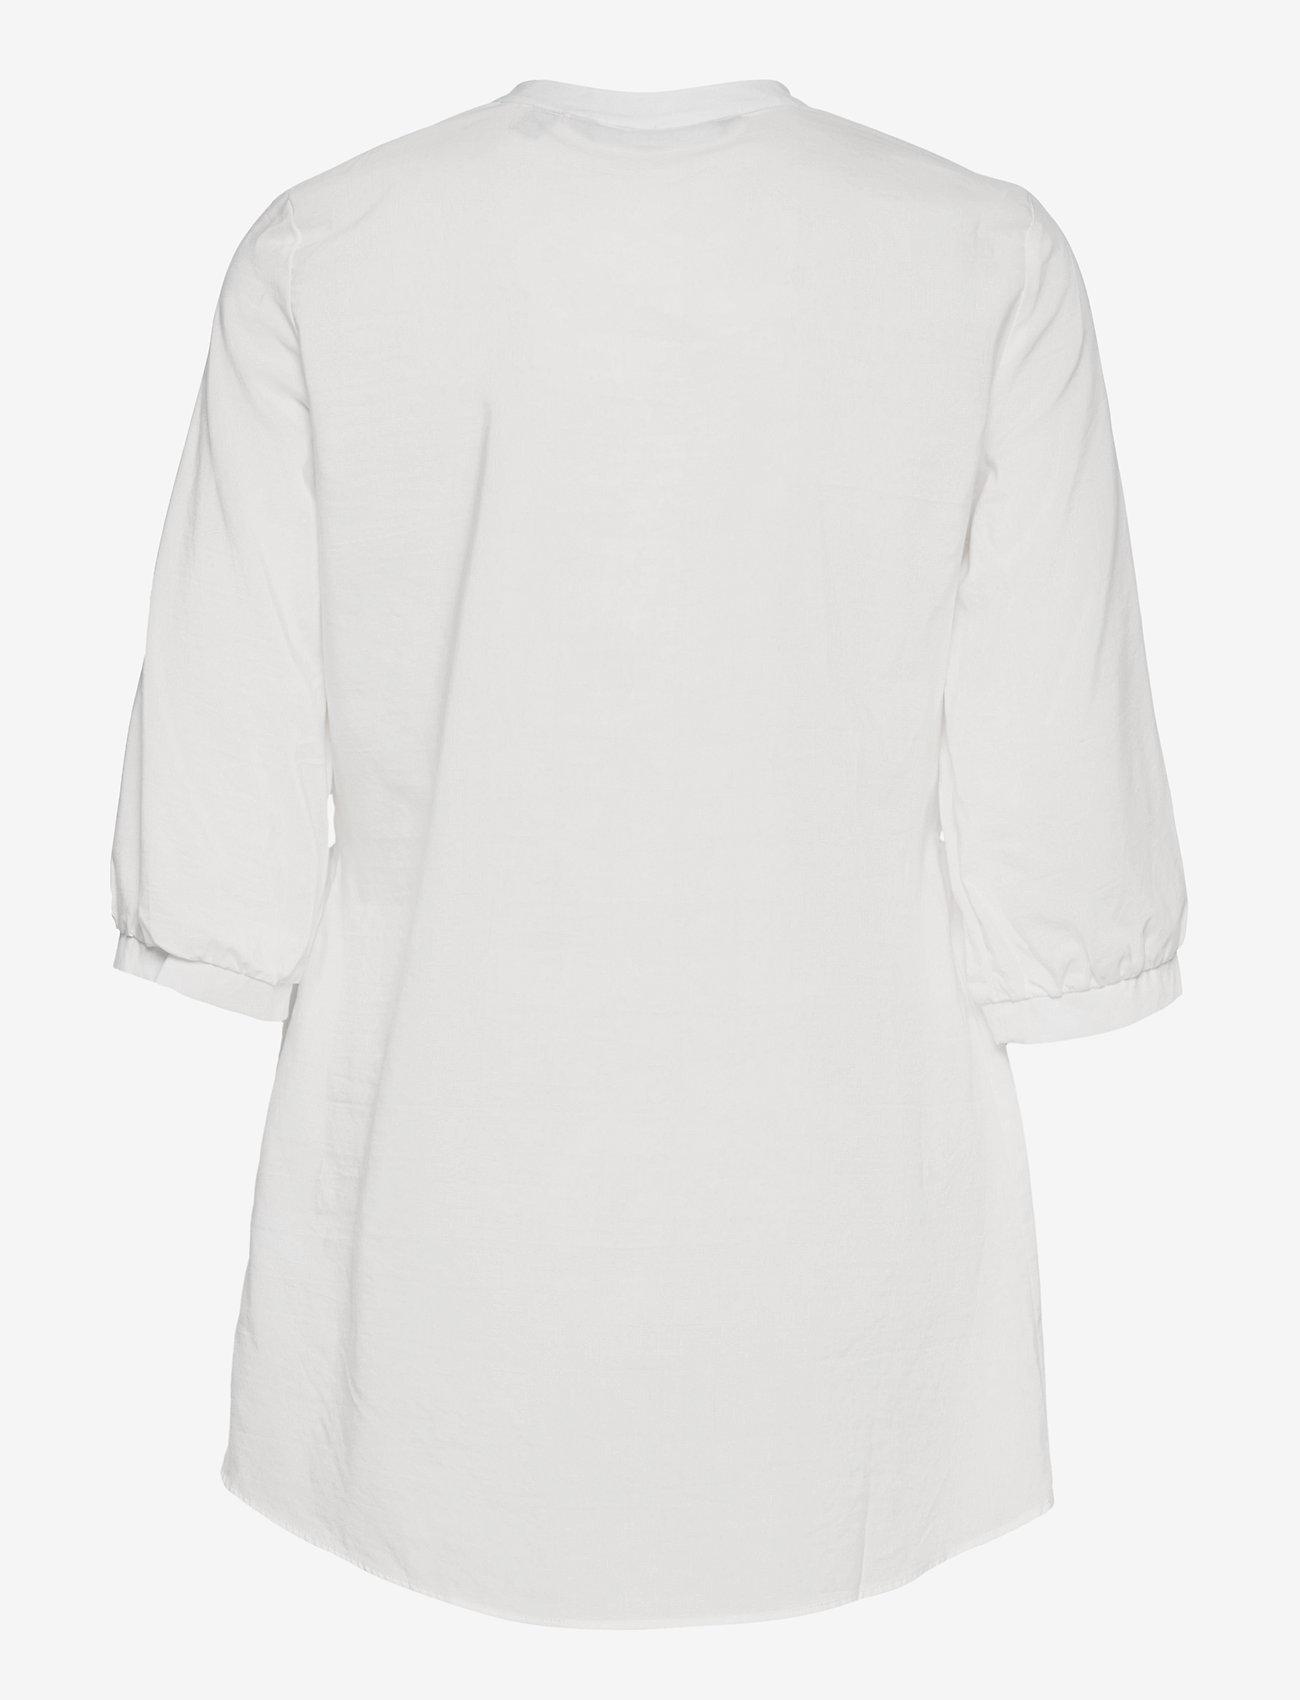 Vero Moda - VMCLARA 3/4 LONG SHIRT - långärmade skjortor - snow white - 1